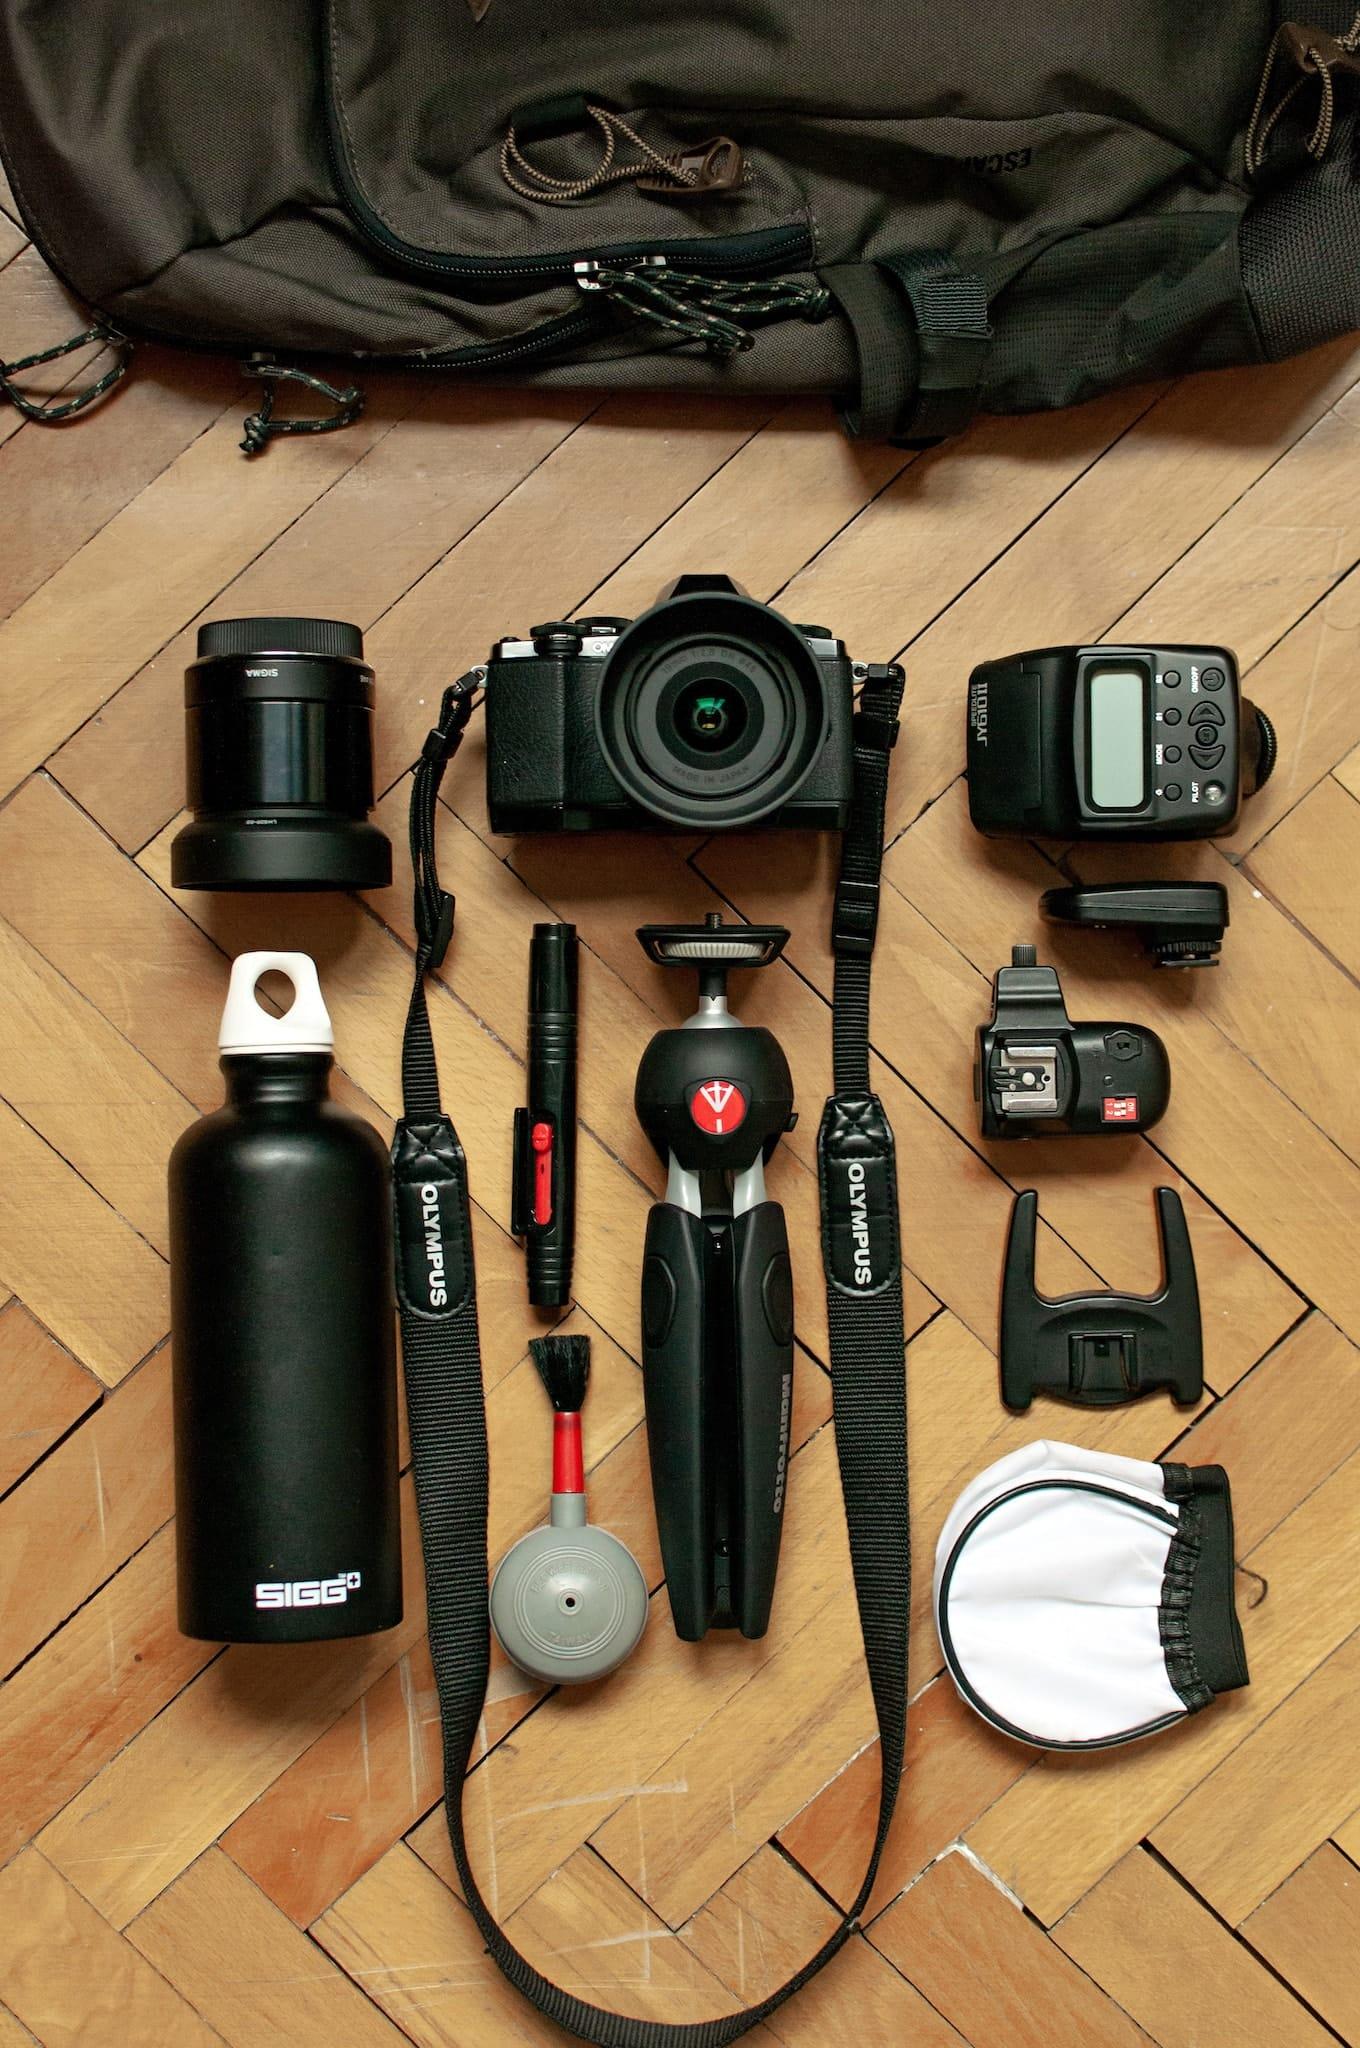 Inside Daniel Gjurchinovski's camera bag - Bag No. 171